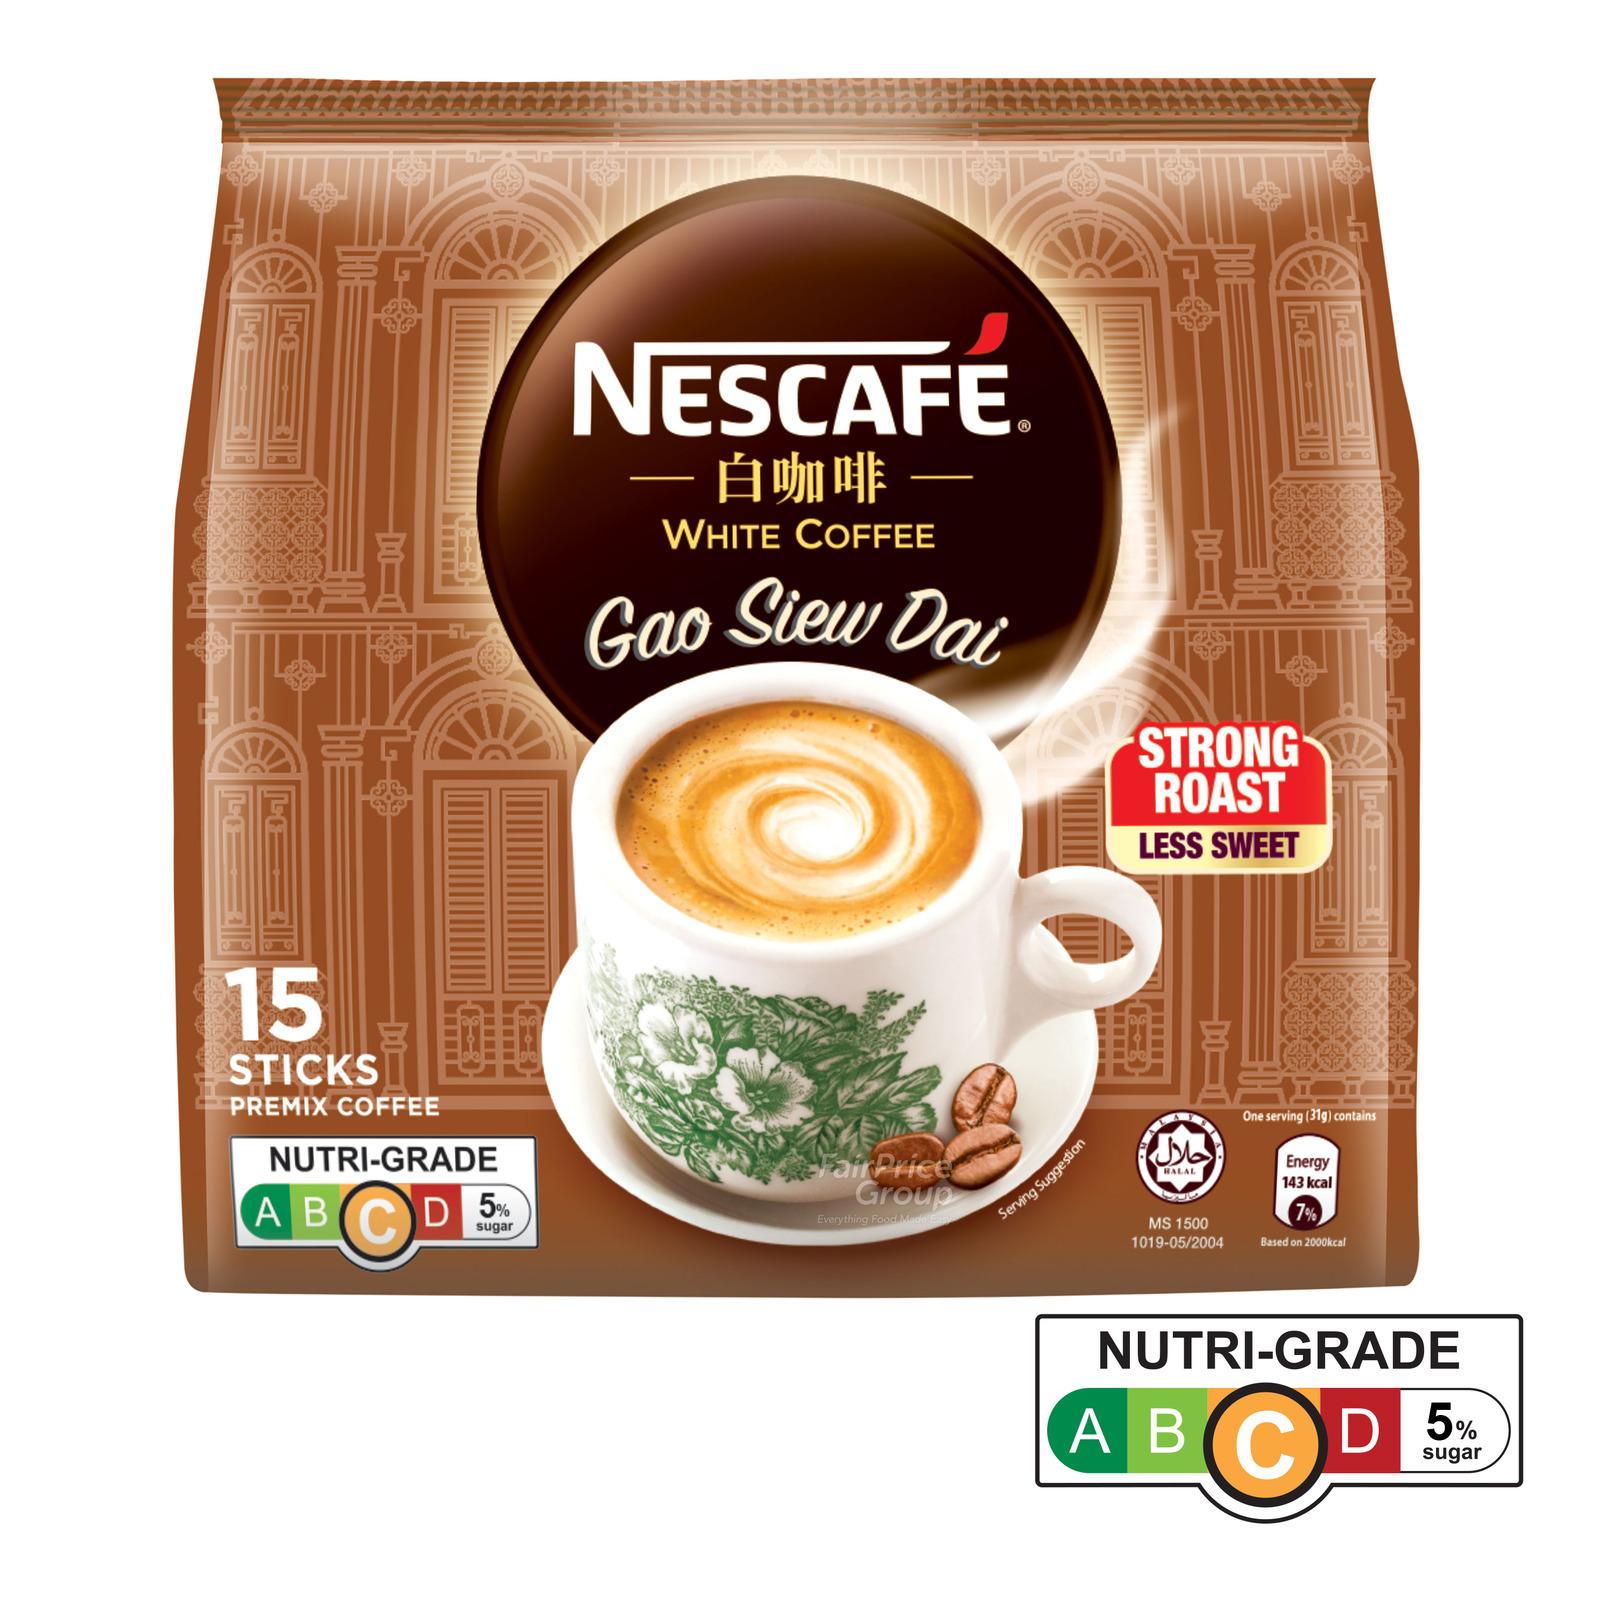 Nescafe Instant Ipoh White Coffee - Gao Siew Dai